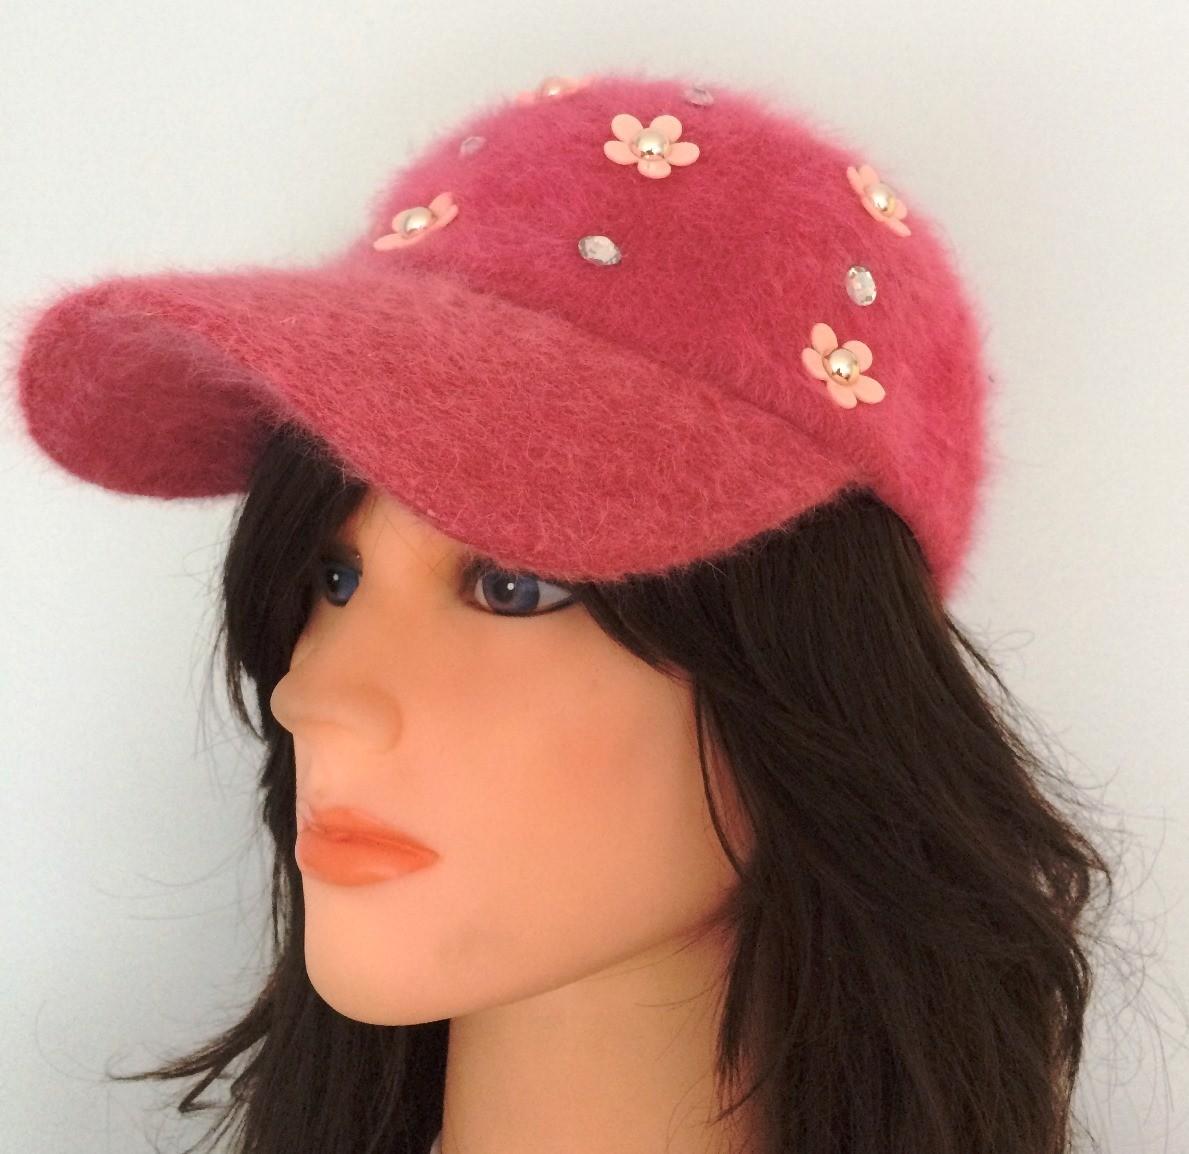 Pink furry bejeweled cap